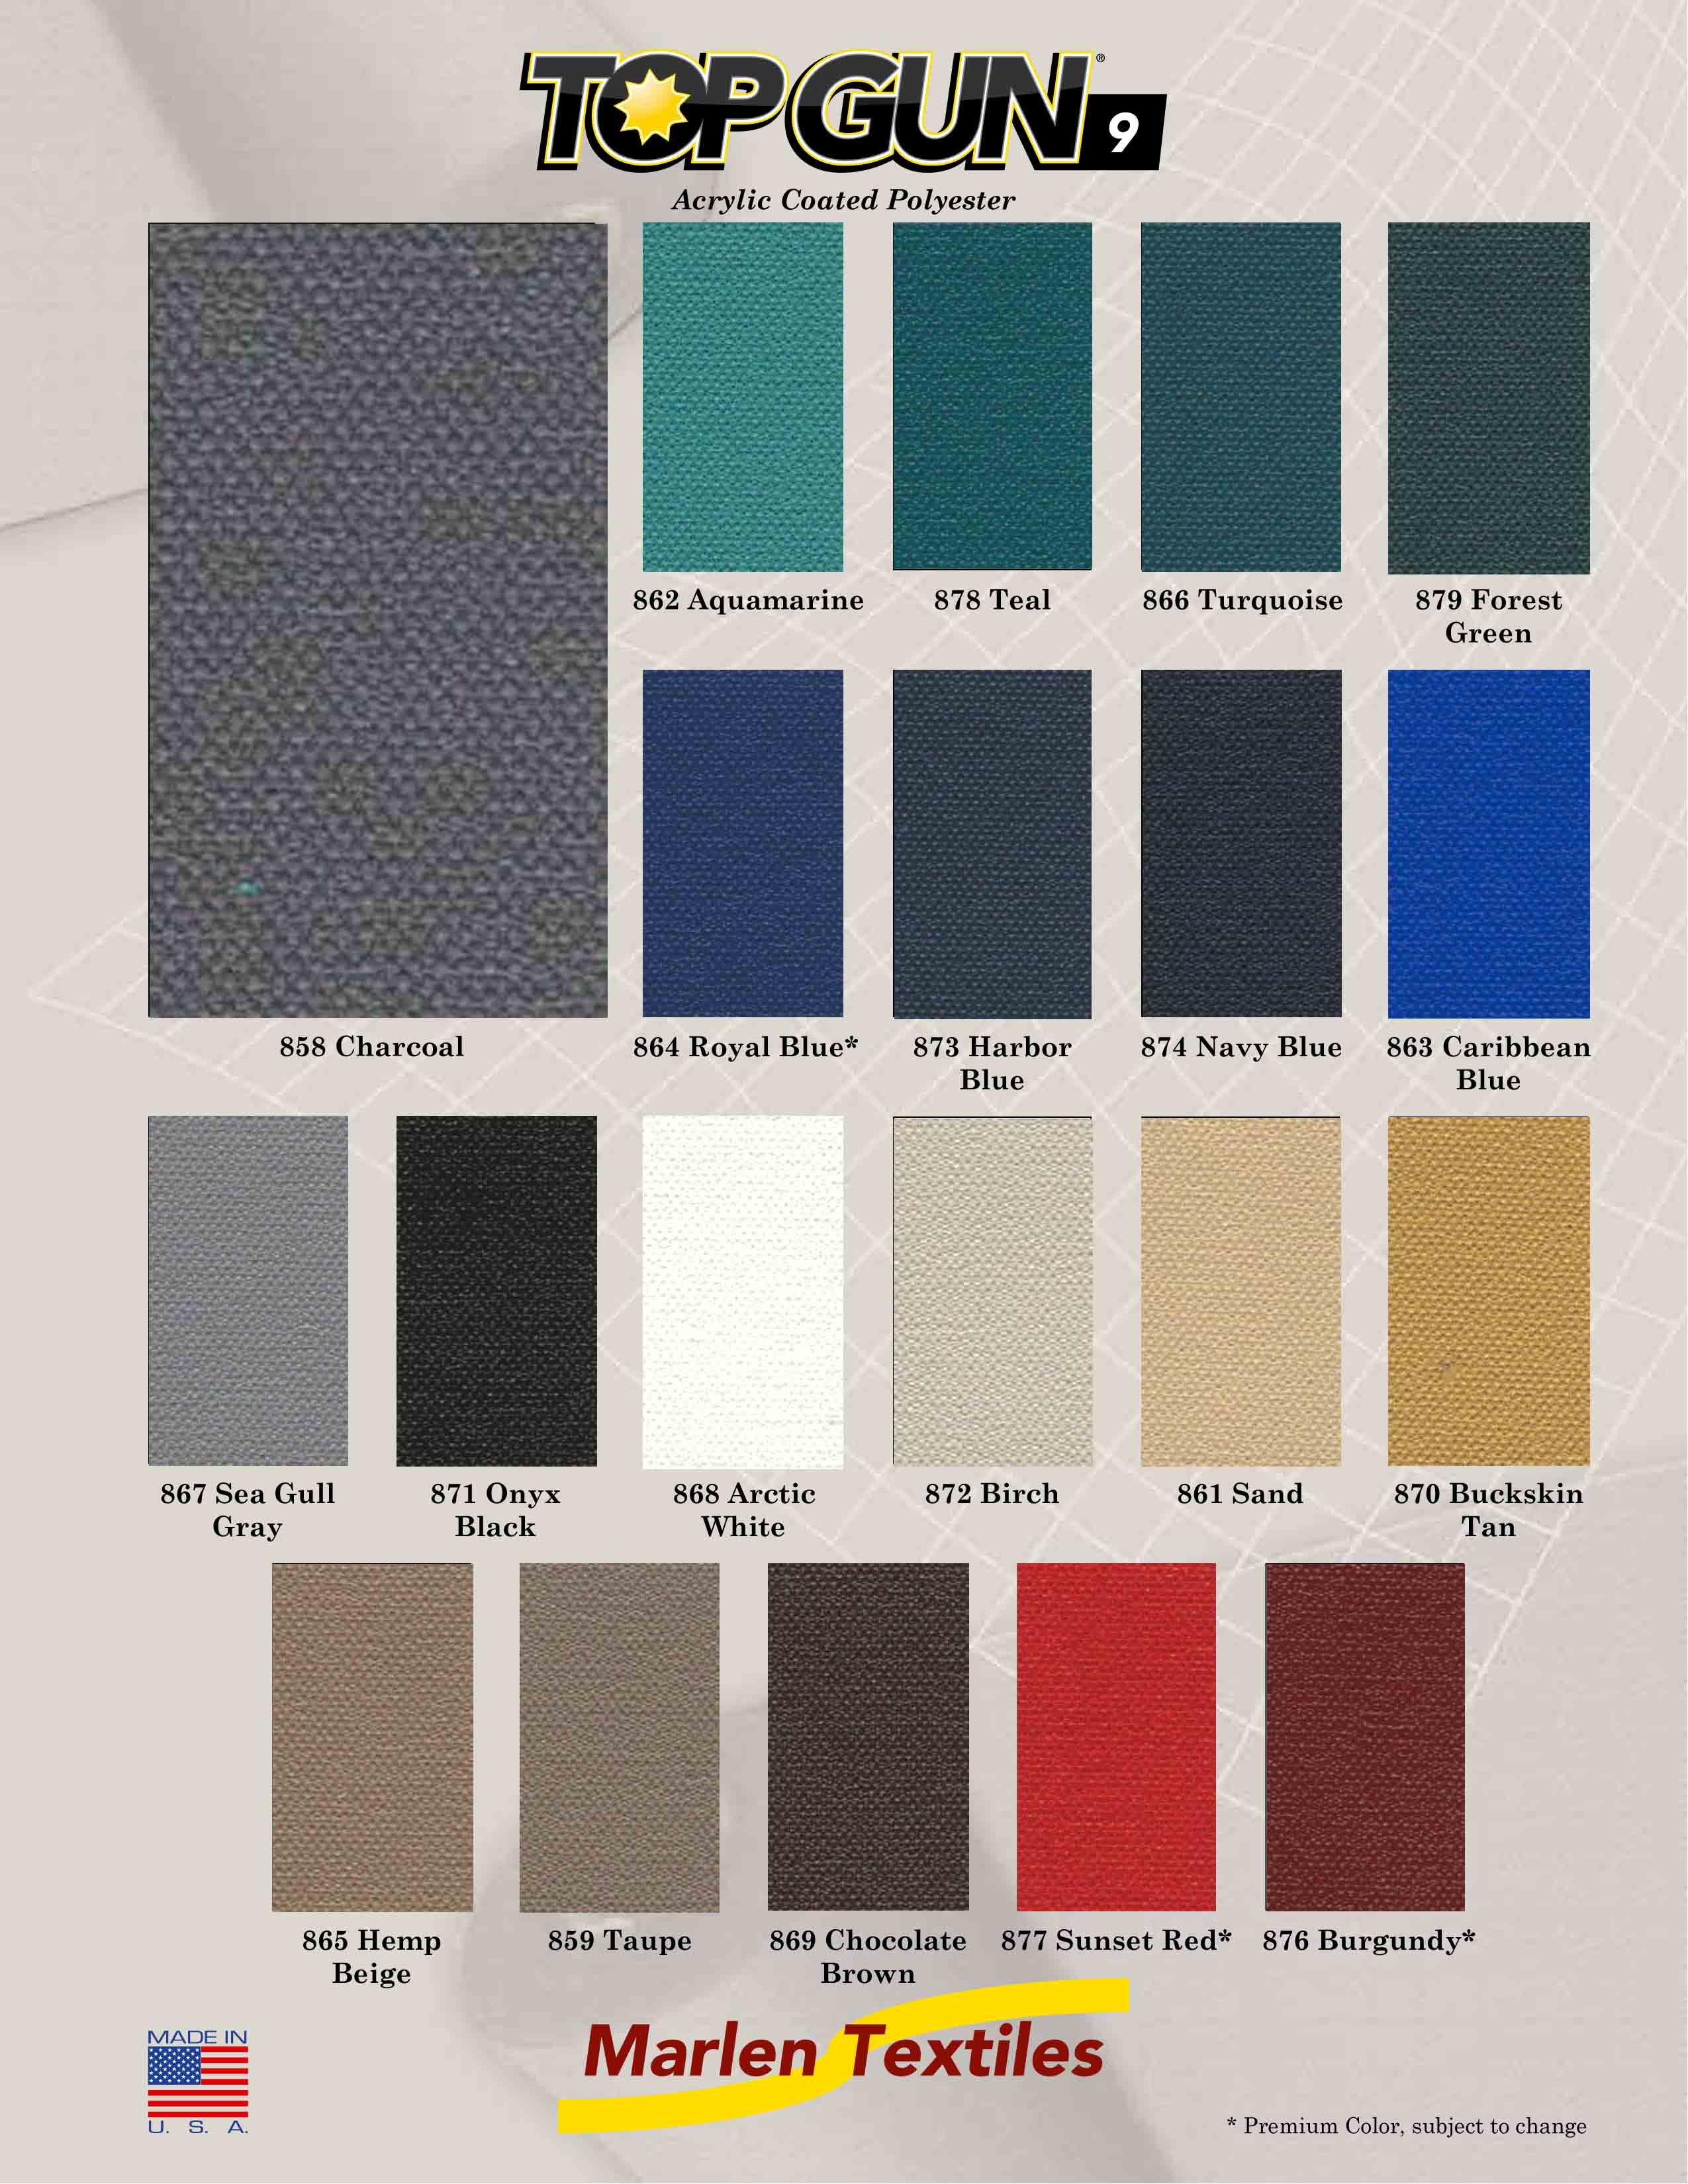 Marlen Textiles Top Gun 9acrylic Coated Polyester Fabric